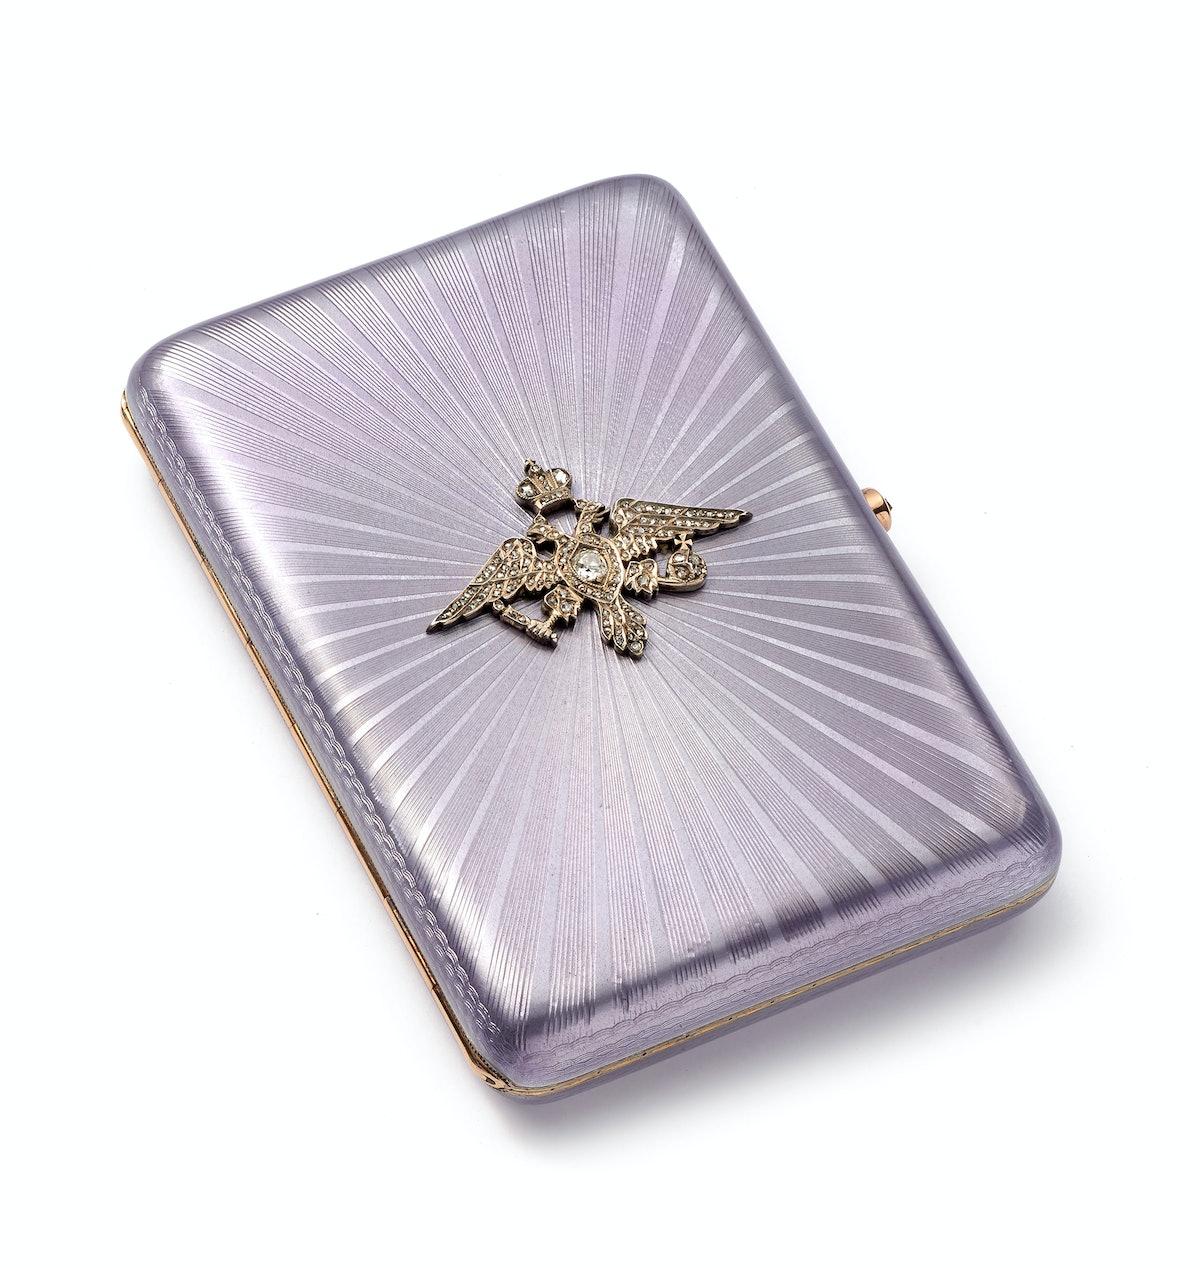 Faberge-Case-01[4]